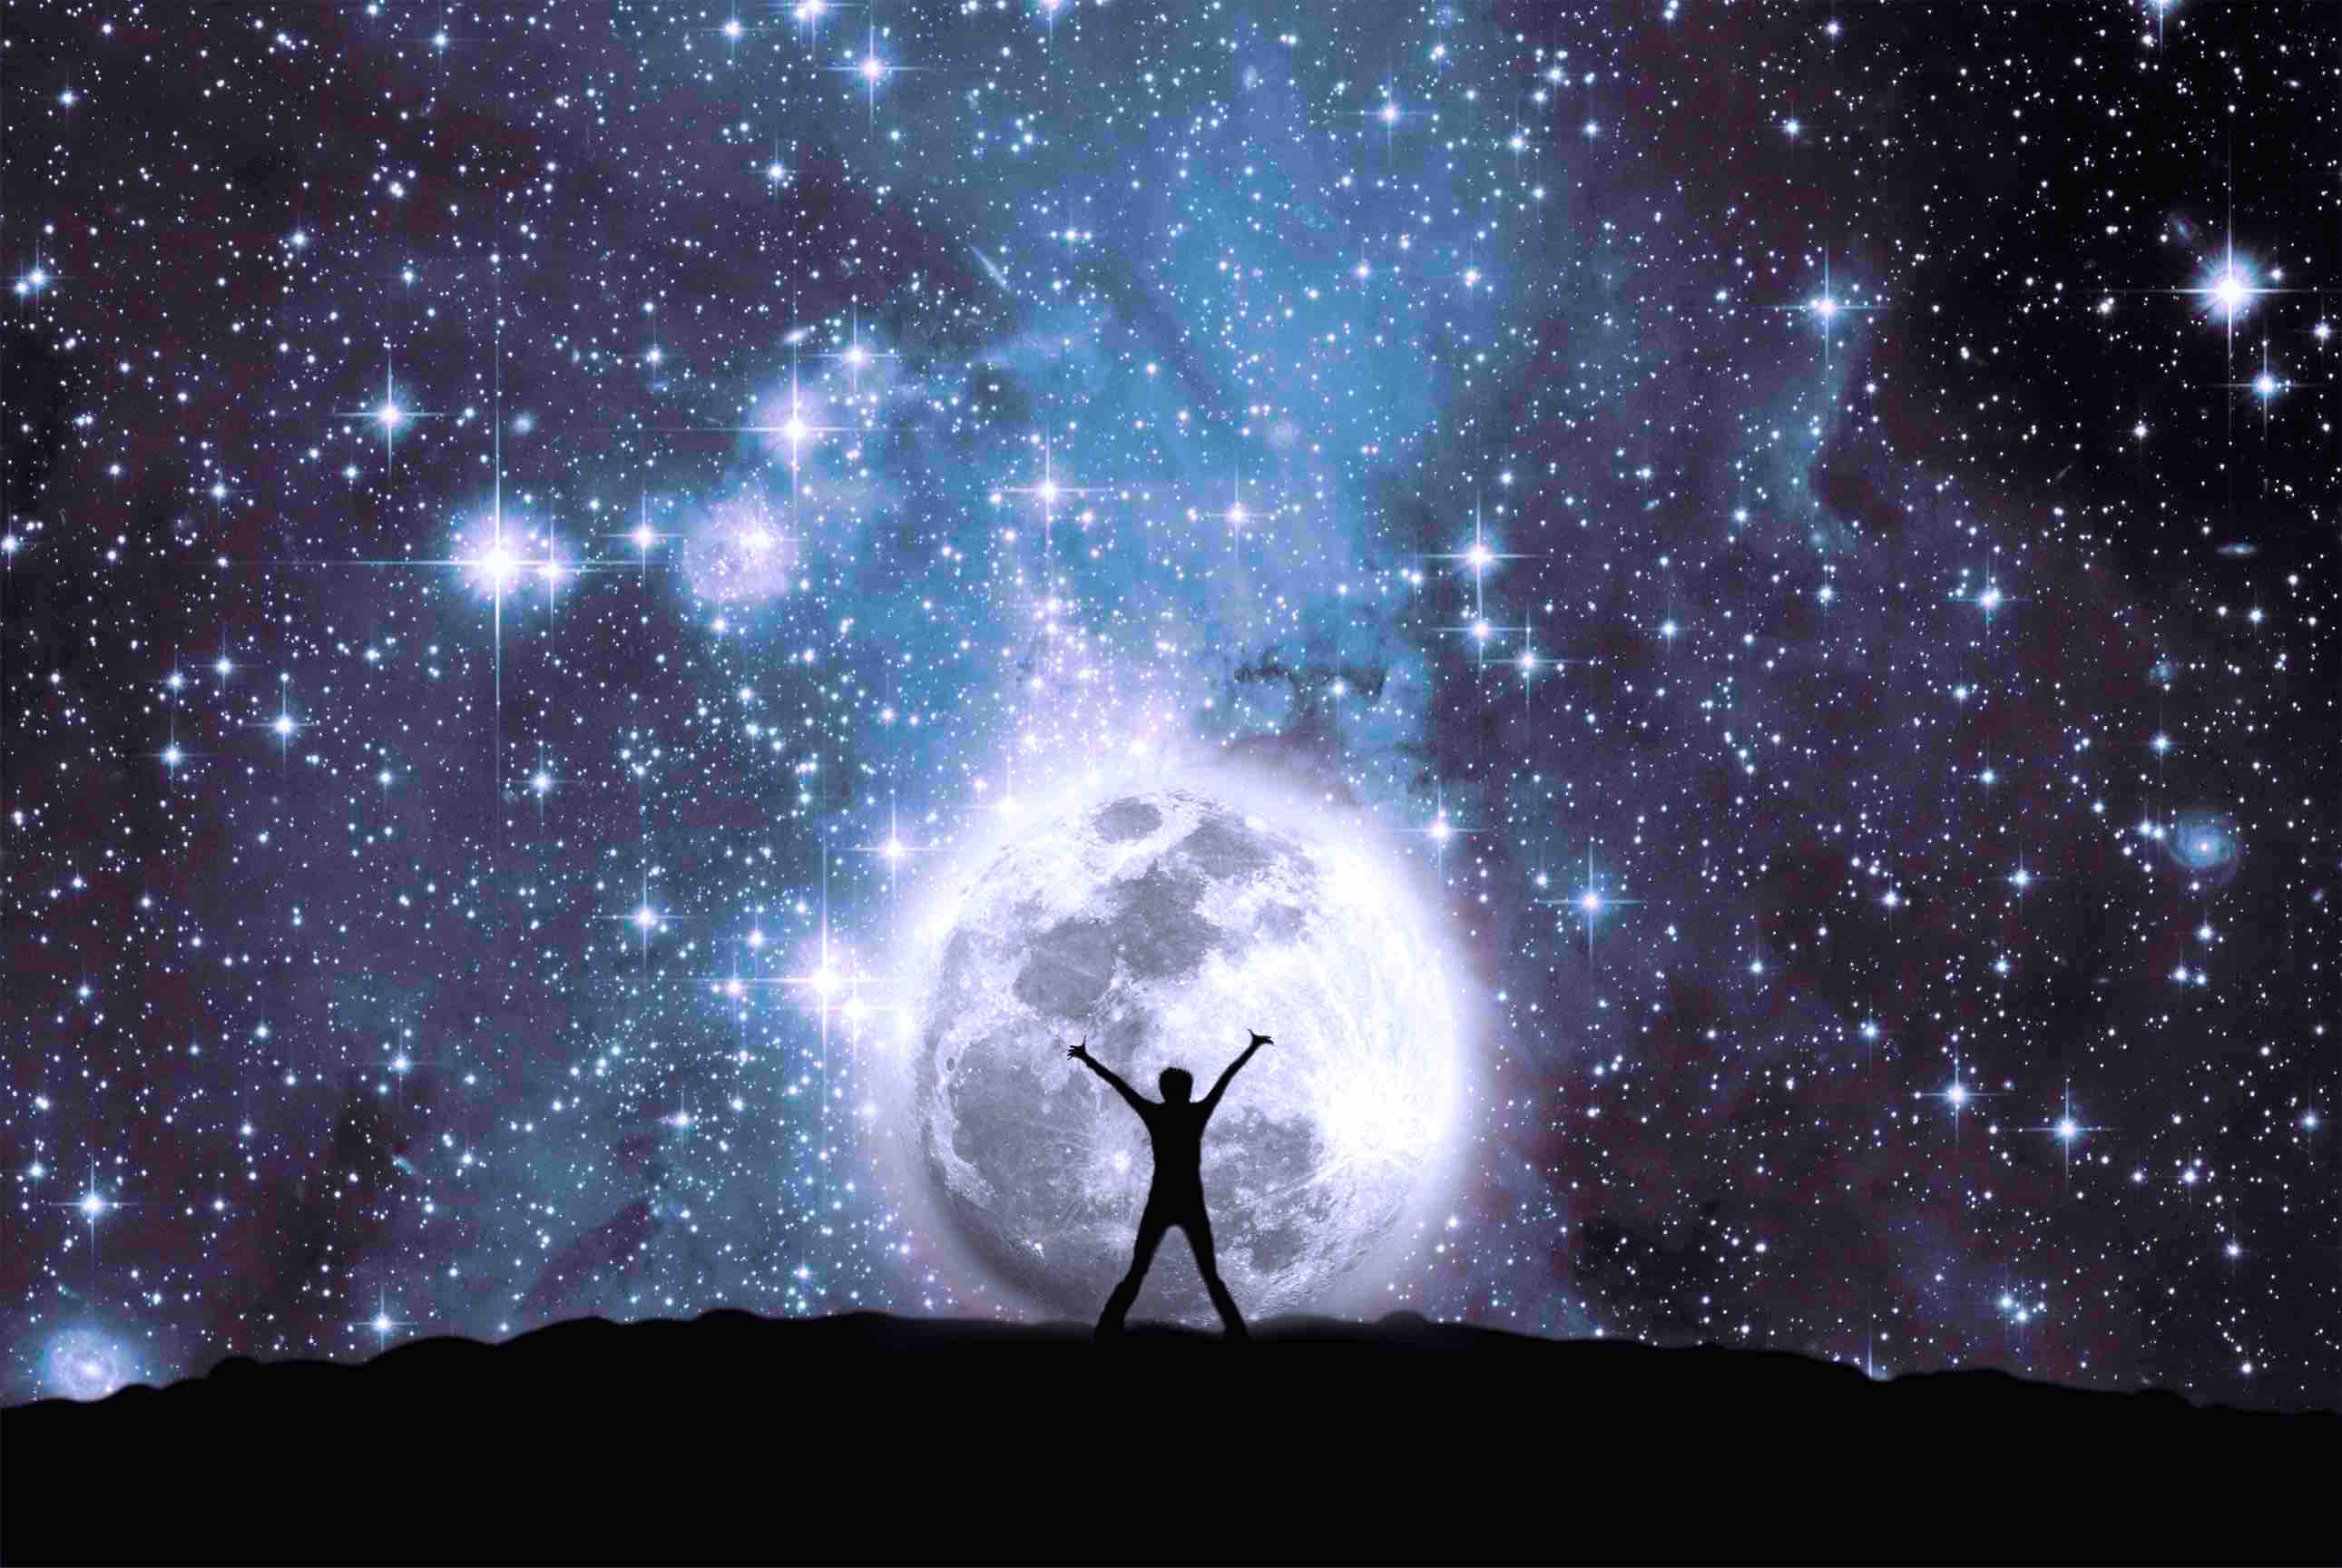 Full Moon 18°53 Sagittarius – Challenges bring the Gift of Wisdom ...